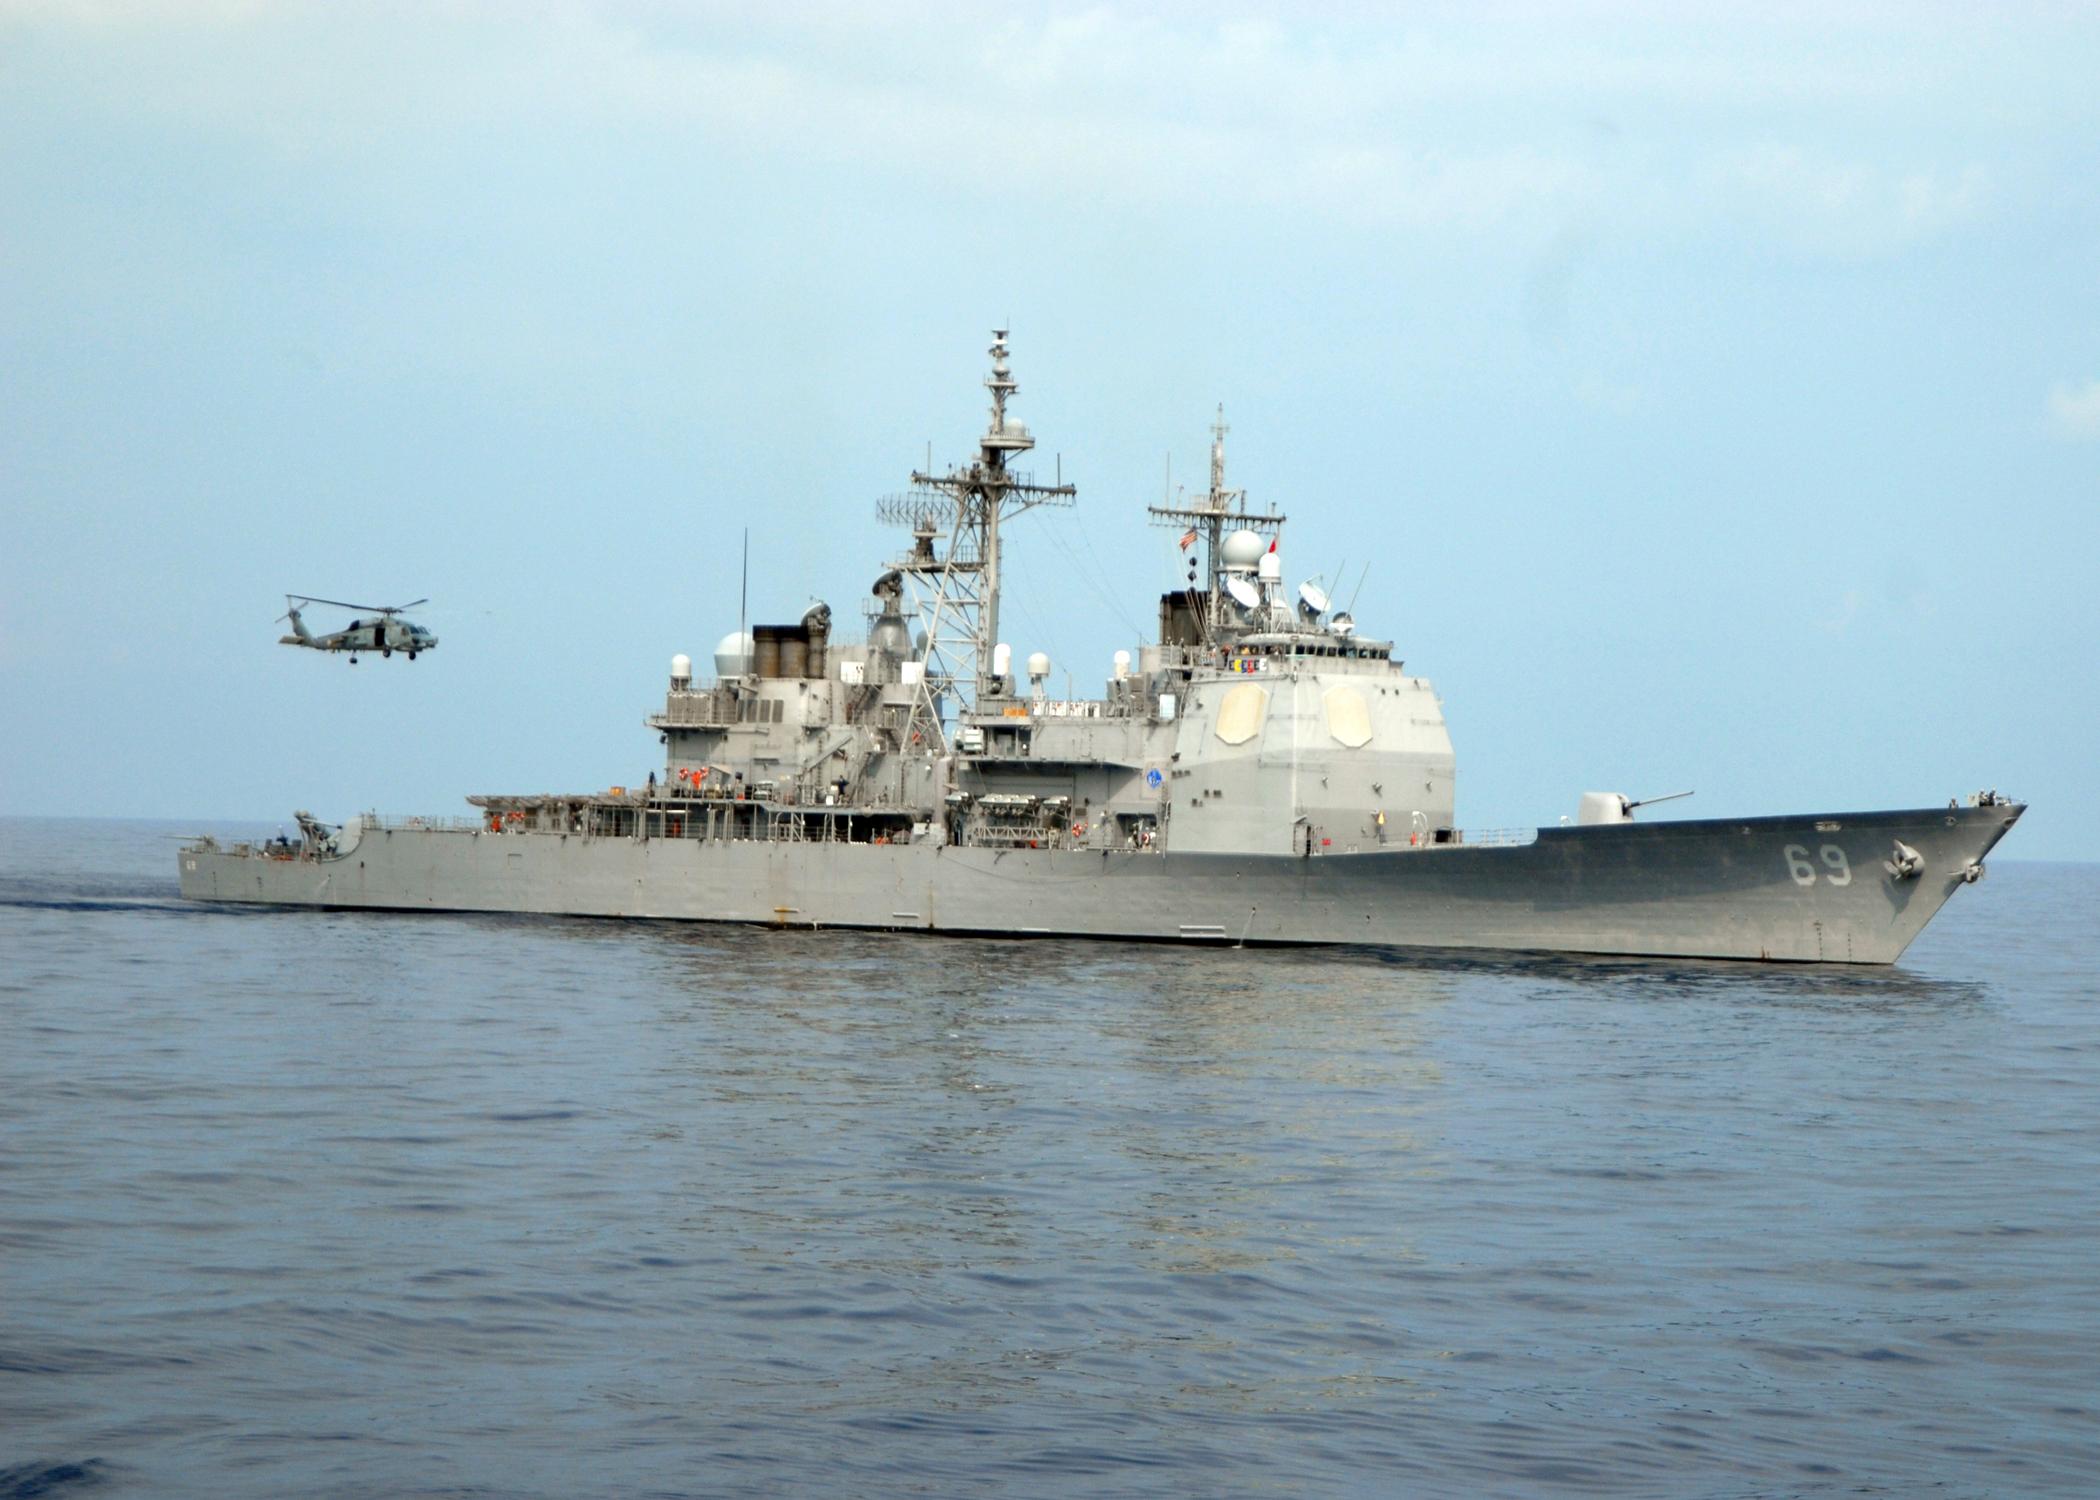 File:USS Vicksburg (CG 69) June 2007